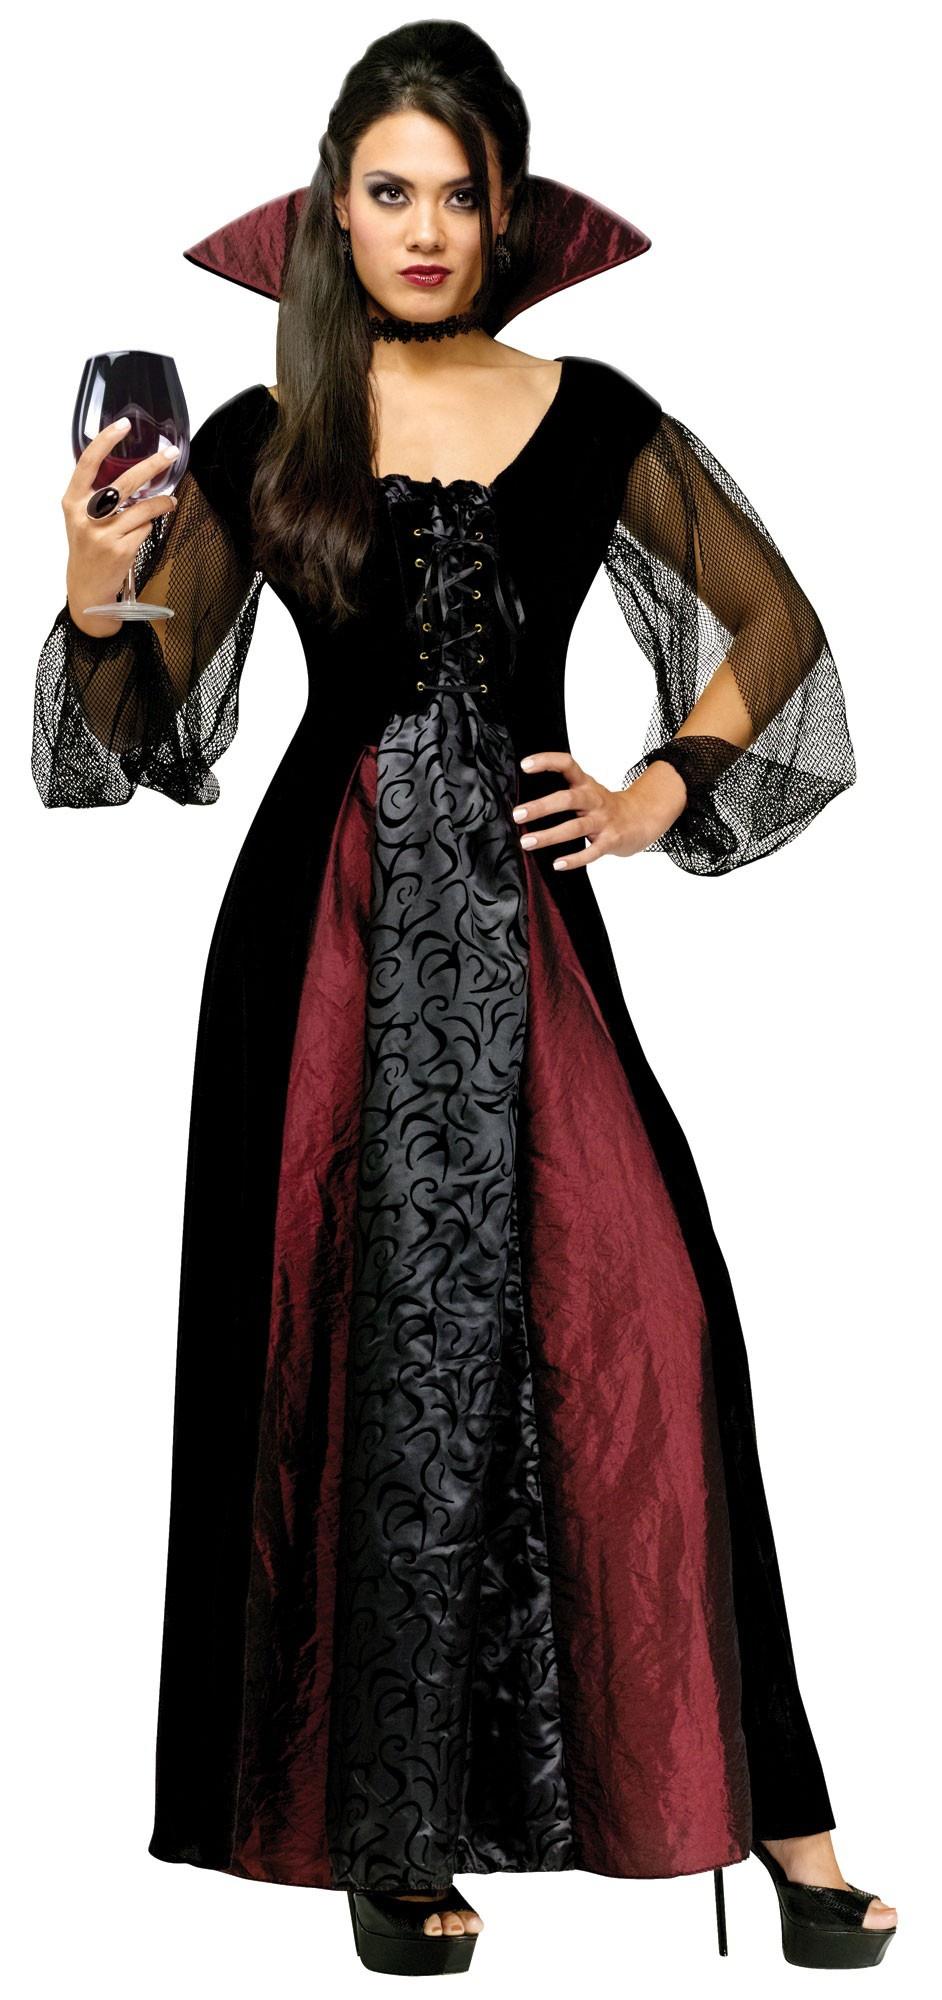 Womens Adult Maiden Gothic Vampire Costume  Mr Costumes - Vampire Costumes